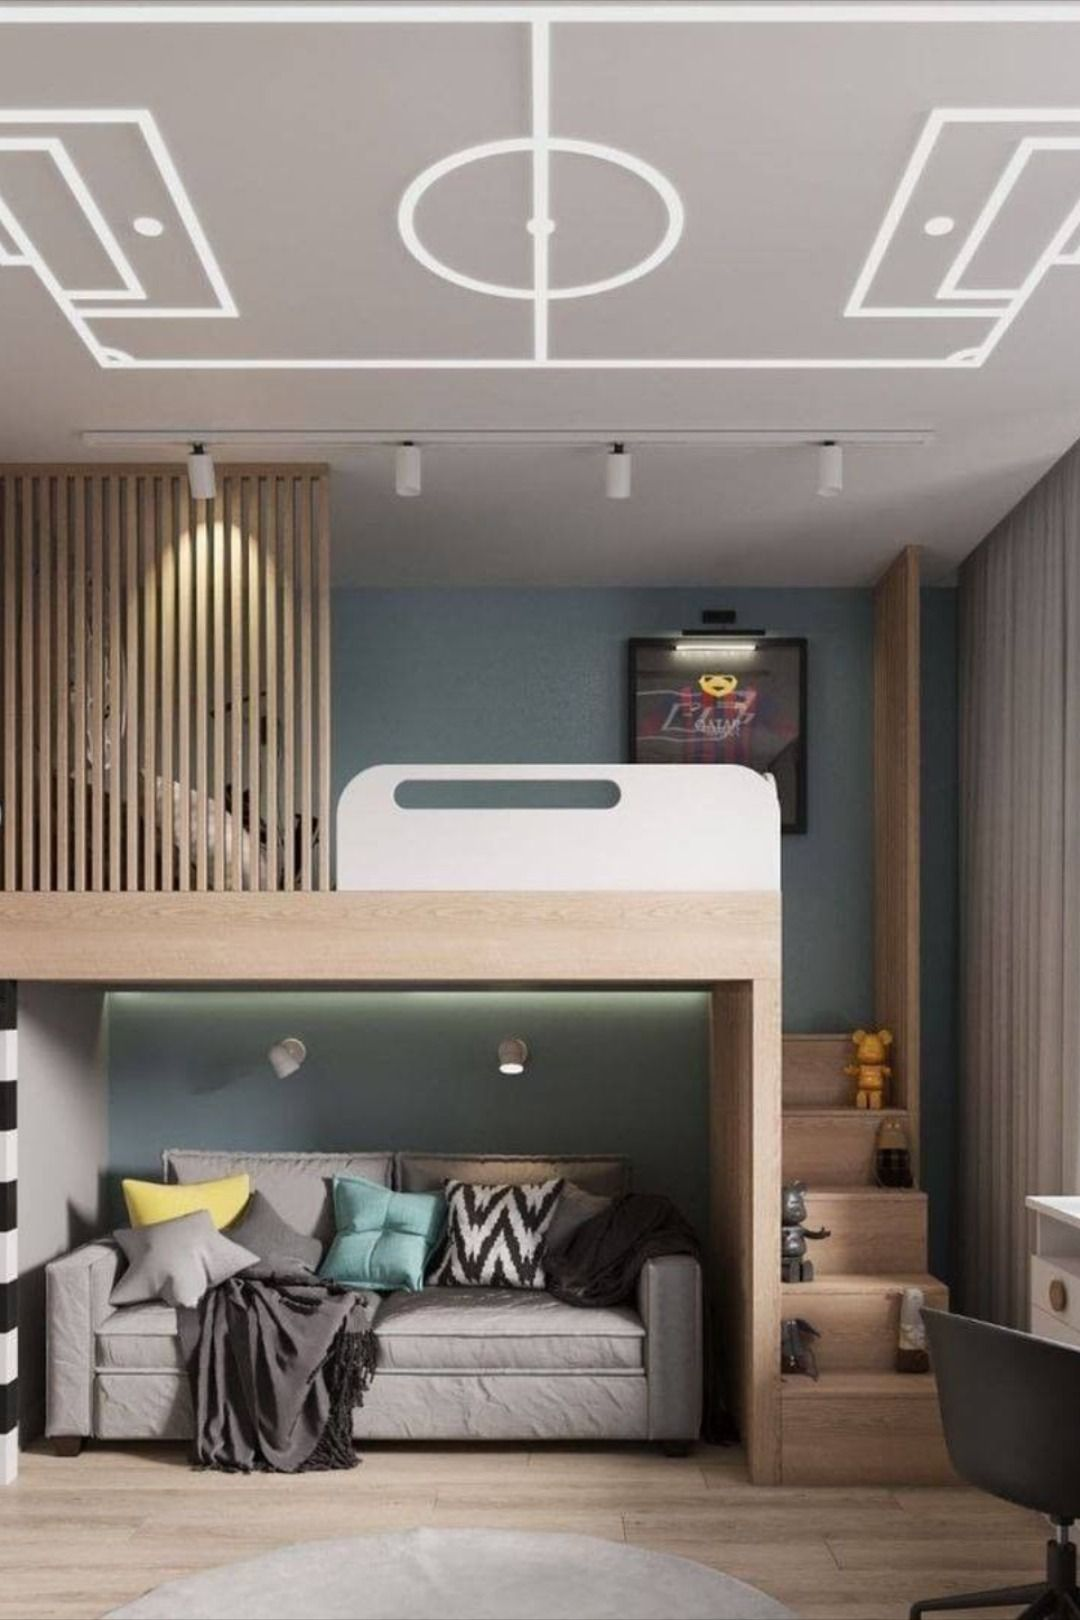 Luxury Kids Bedroom Ideas For Boys In 2021 Kids Interior Room Kids Room Design Cool Kids Bedrooms Kids room design 2021